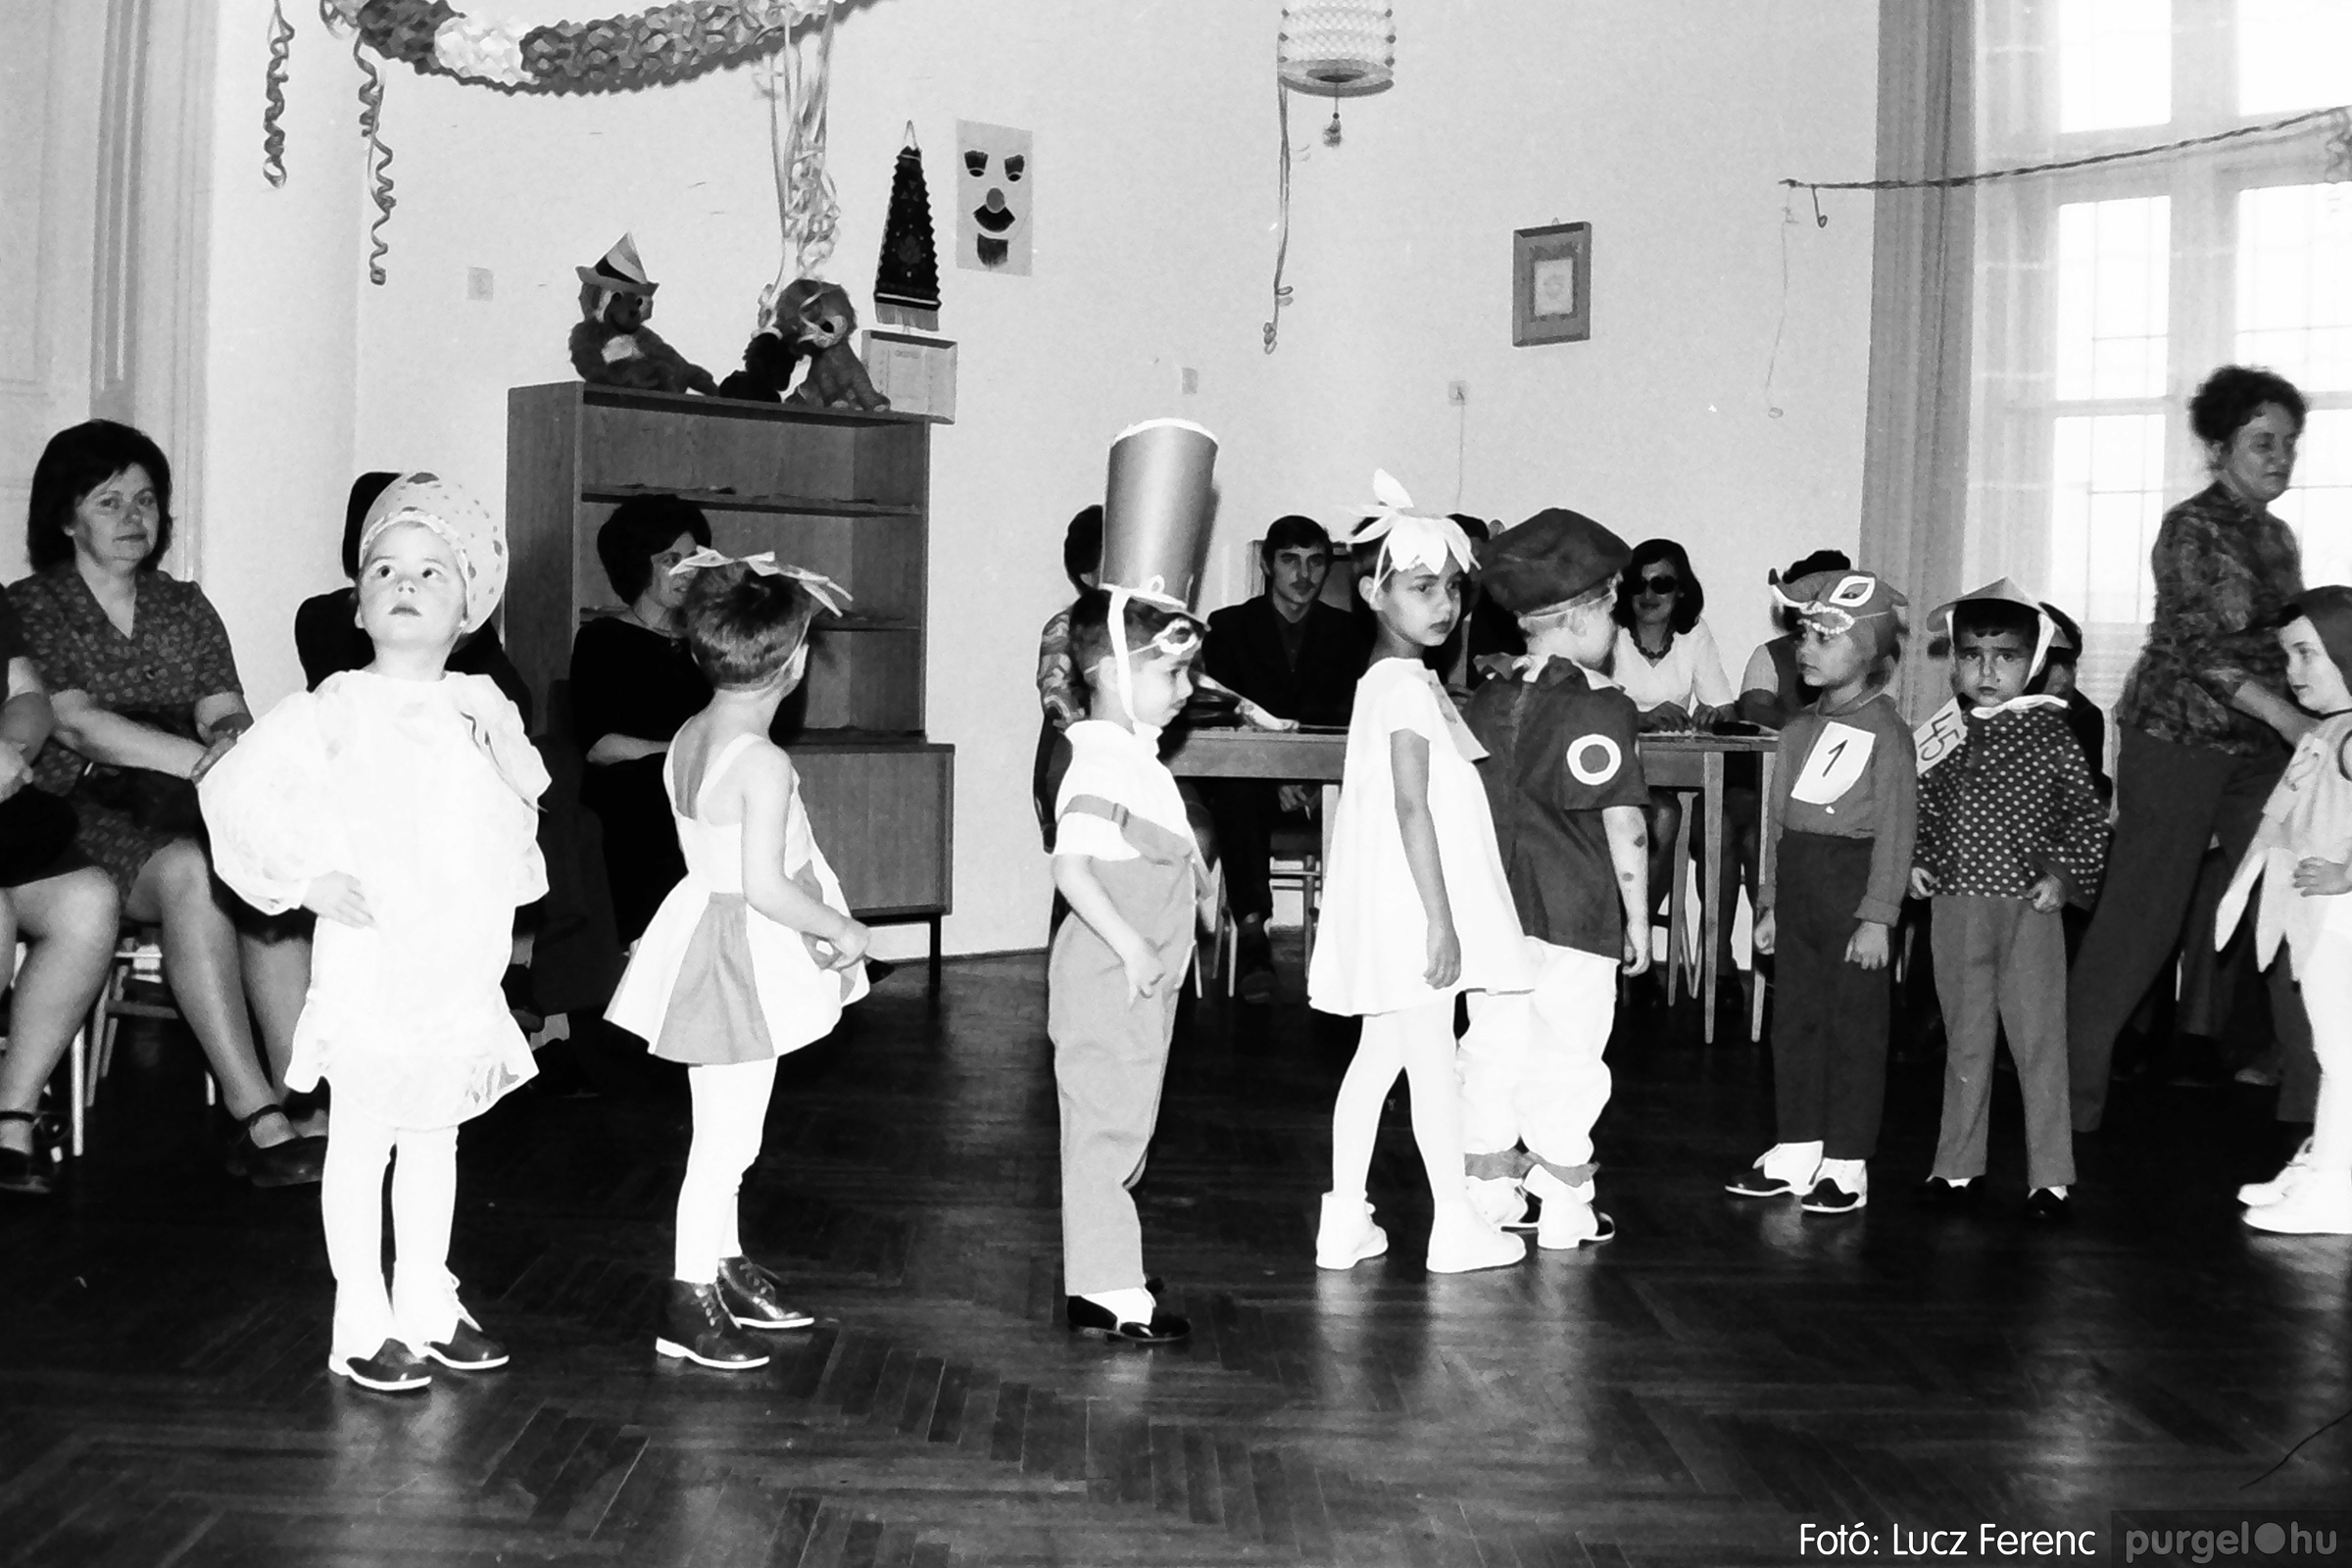 074. 1977. Farsang a gyermekotthonban 003. - Fotó: Lucz Ferenc.jpg